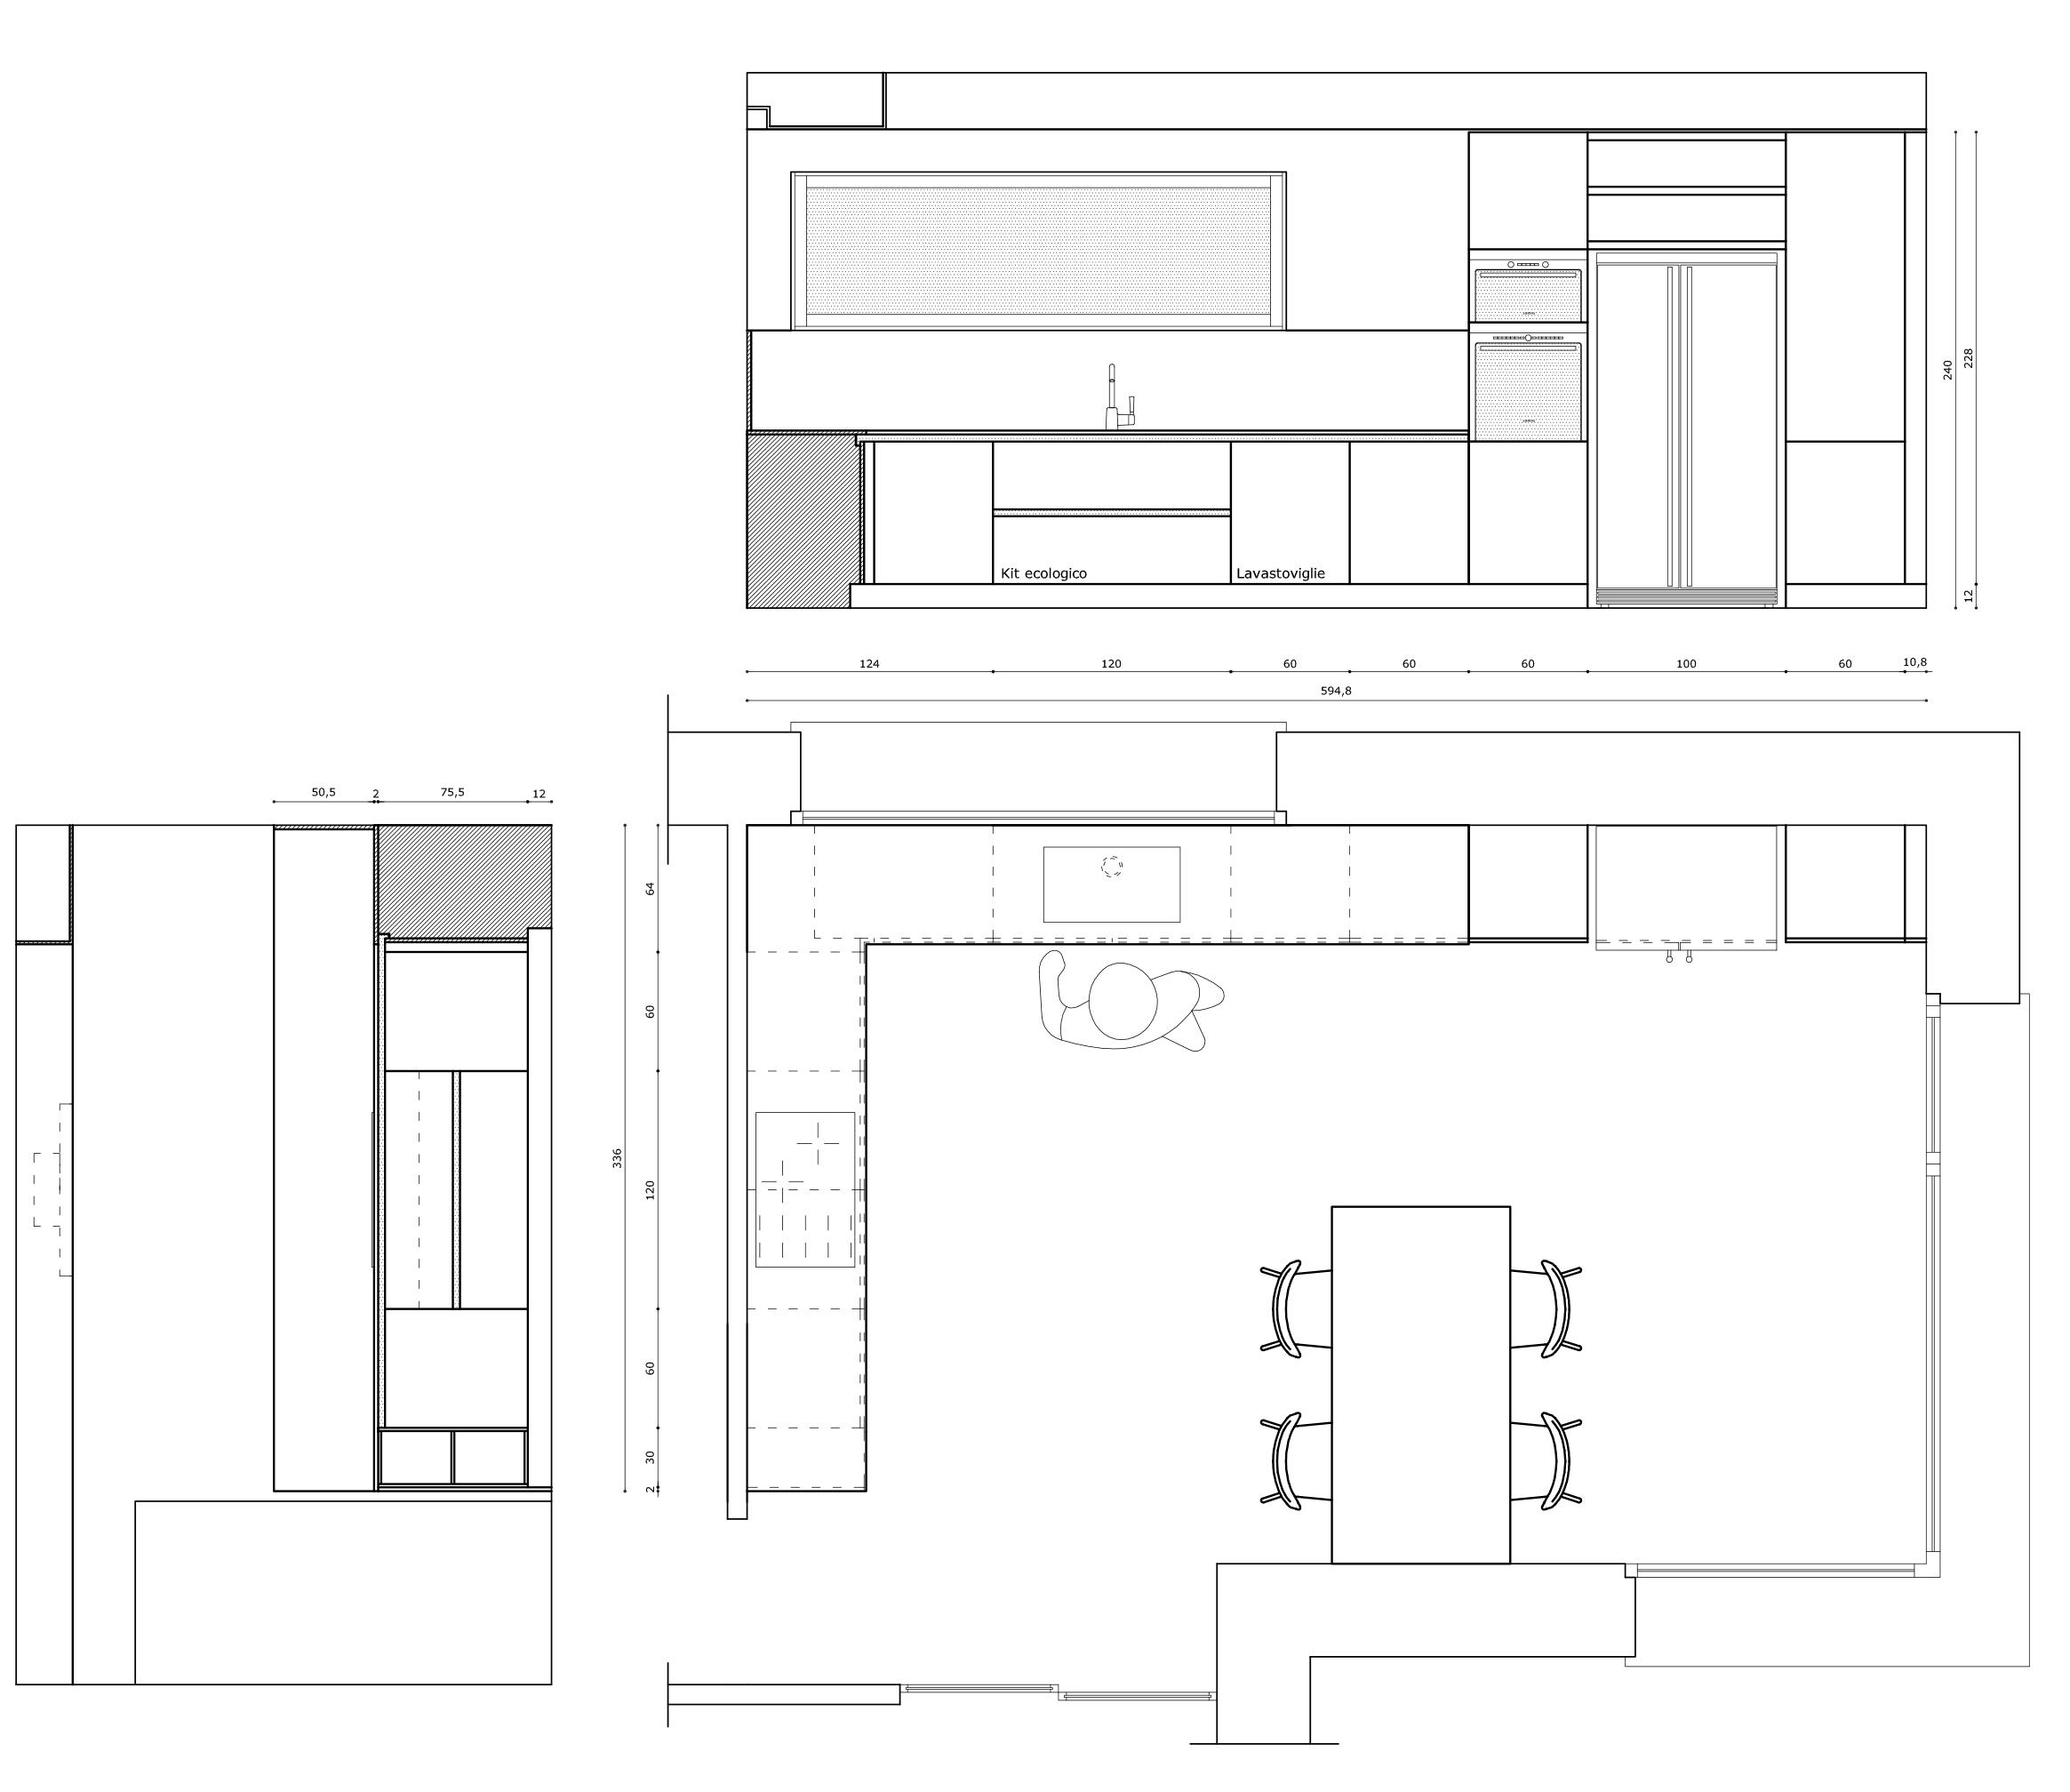 D:�9-LAVORO�1-SIMONE�8-ARCHITETTIARCH. MASSIMO RAPANA'�1-ST